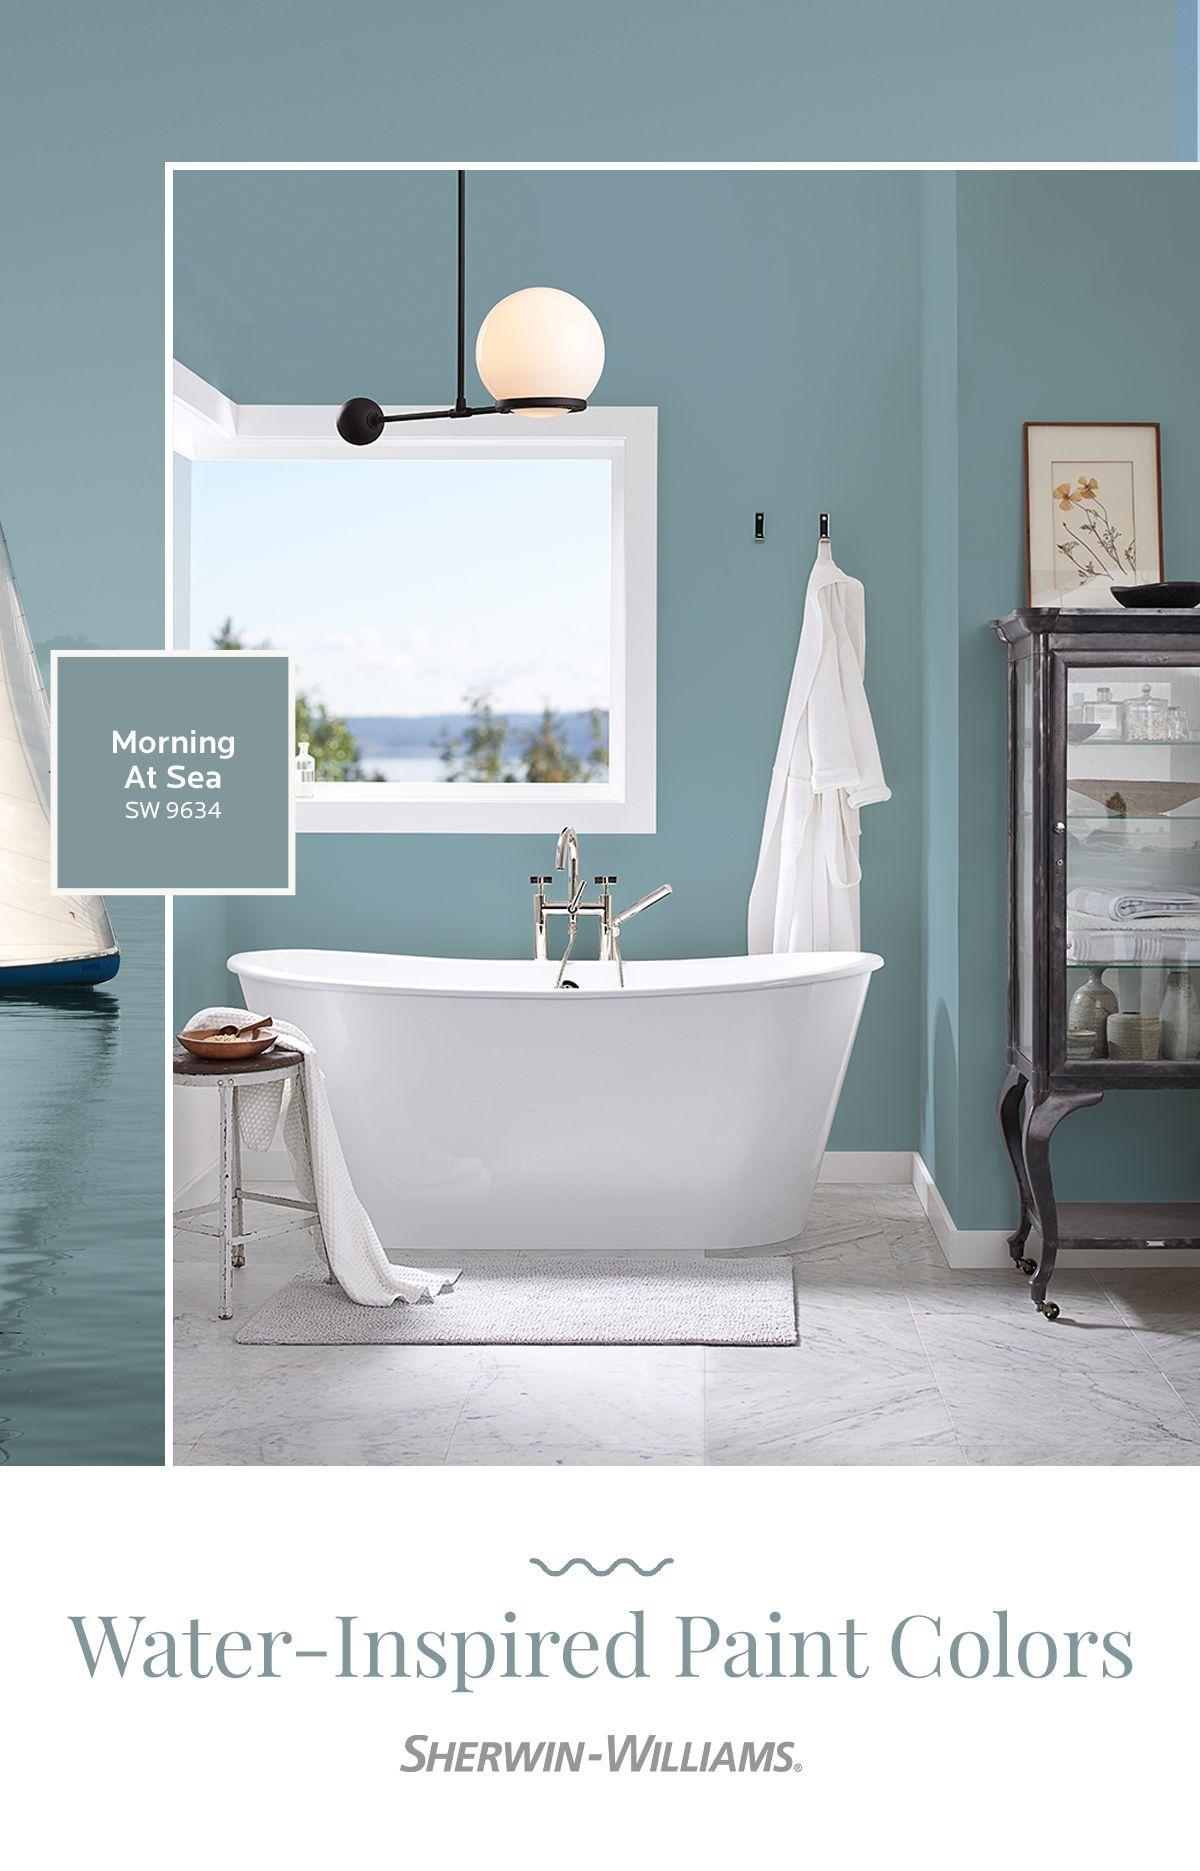 Bathroom Paint Color Inspiration, Bathroom Paint Colors For Small Bathrooms 2021